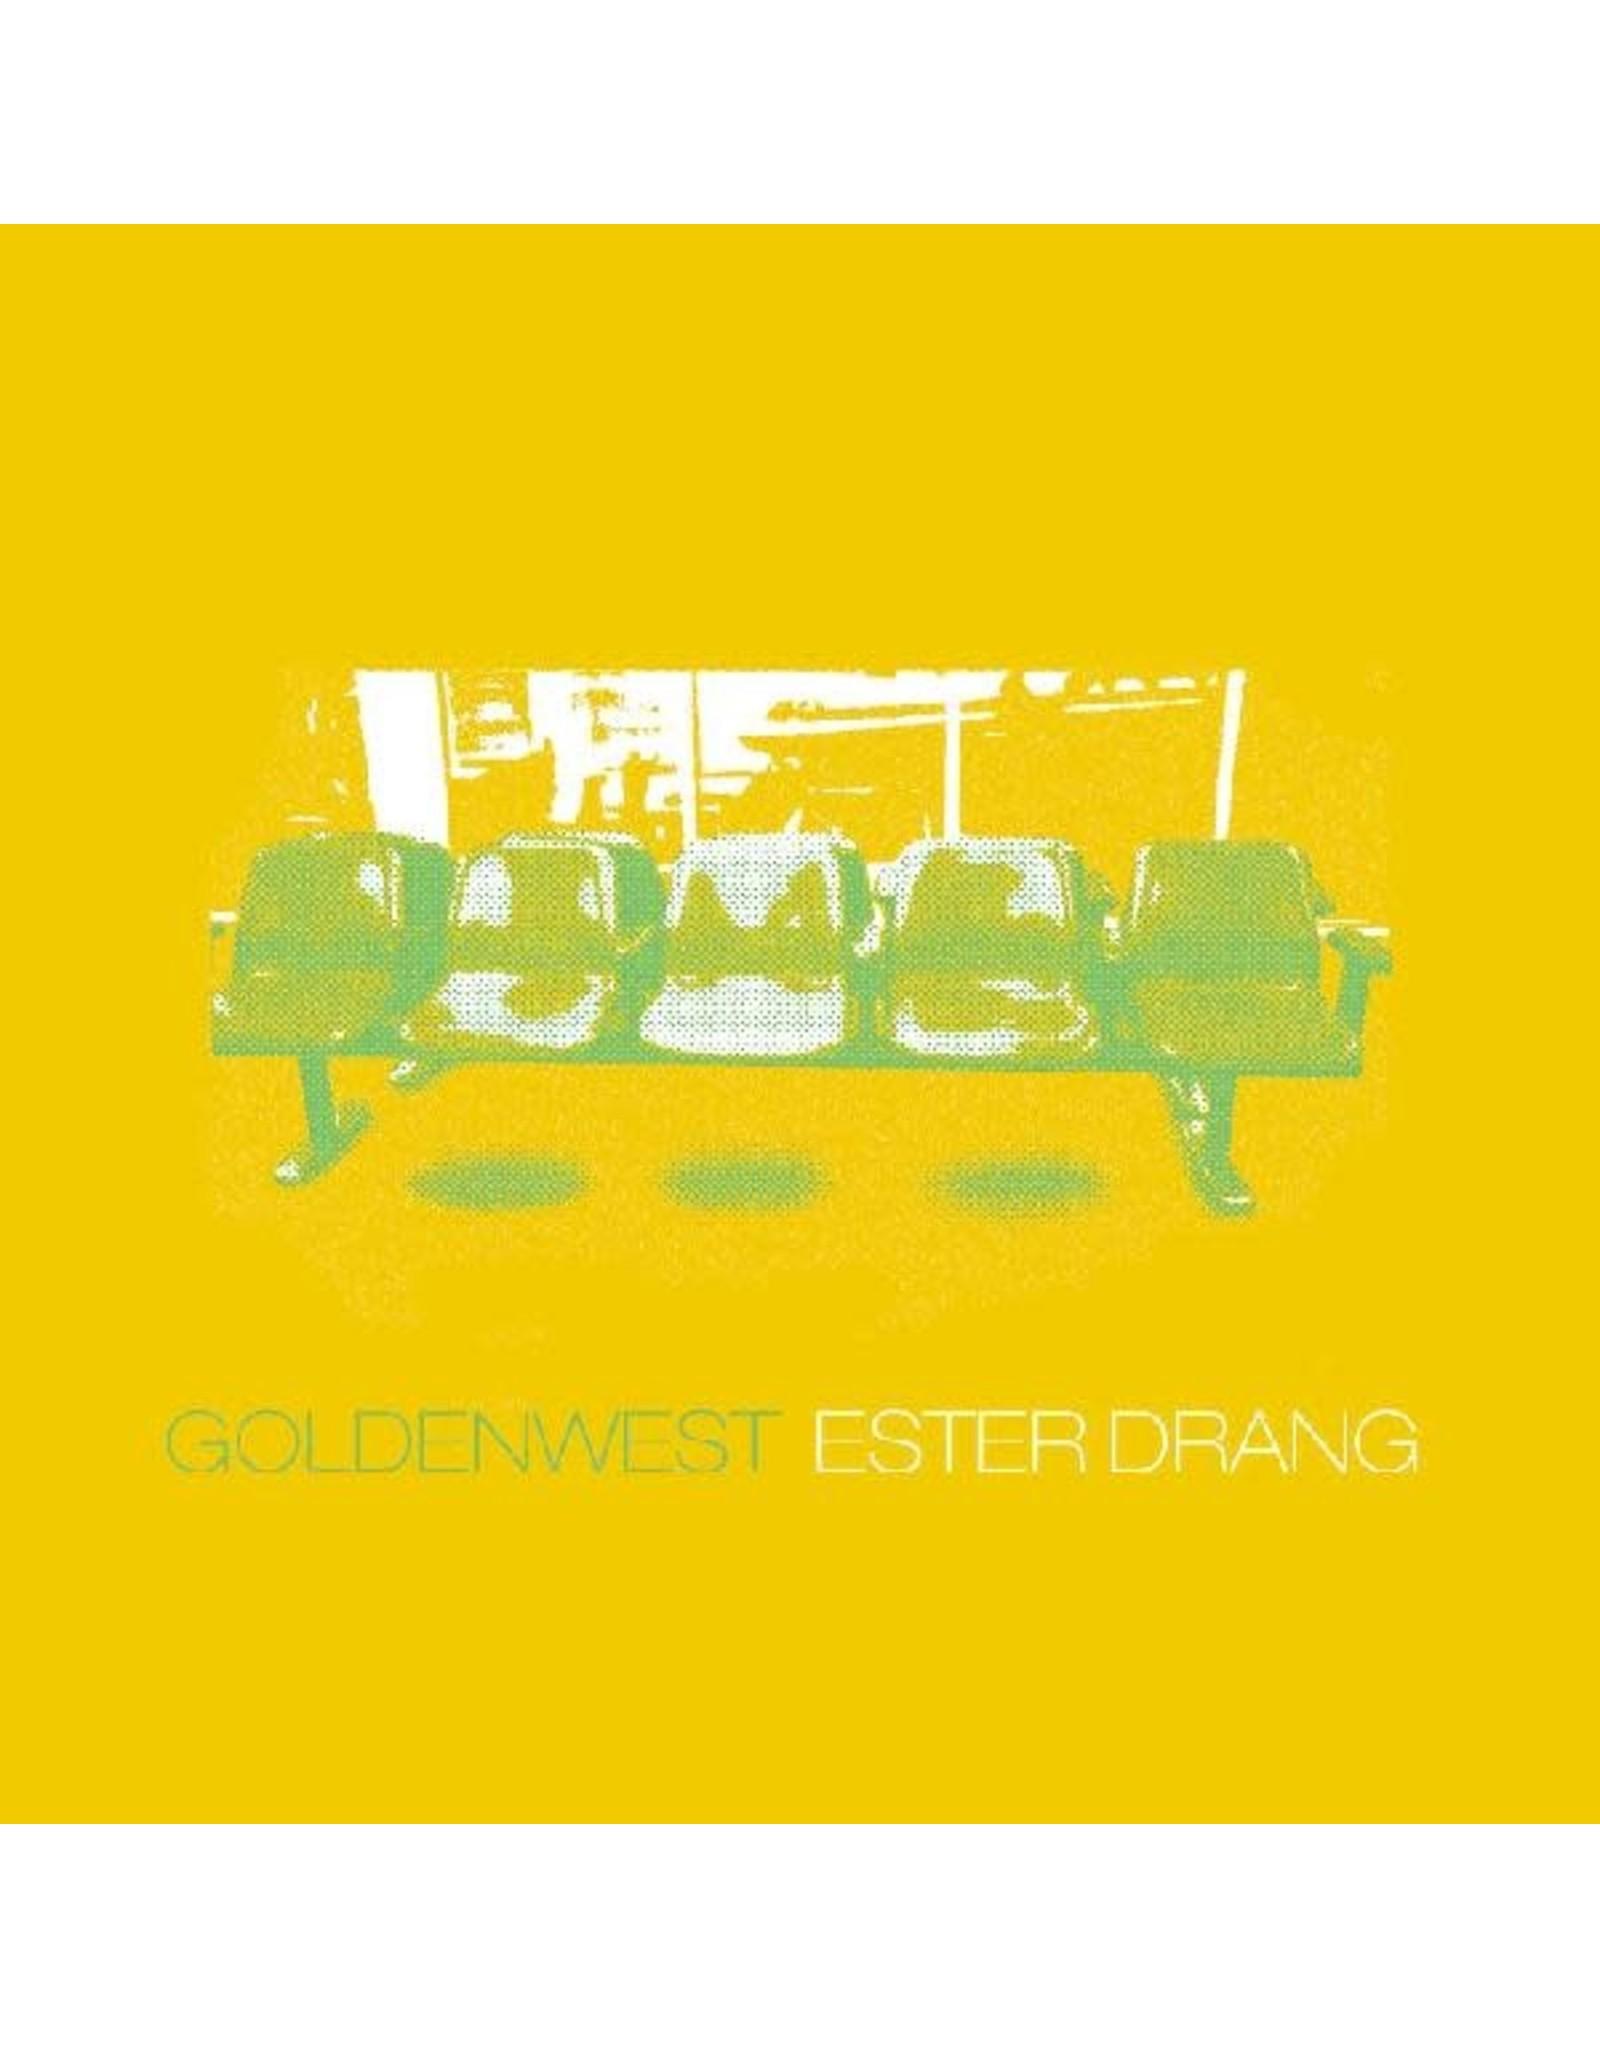 New Vinyl Ester Drang - Goldenwest (Colored) 2LP